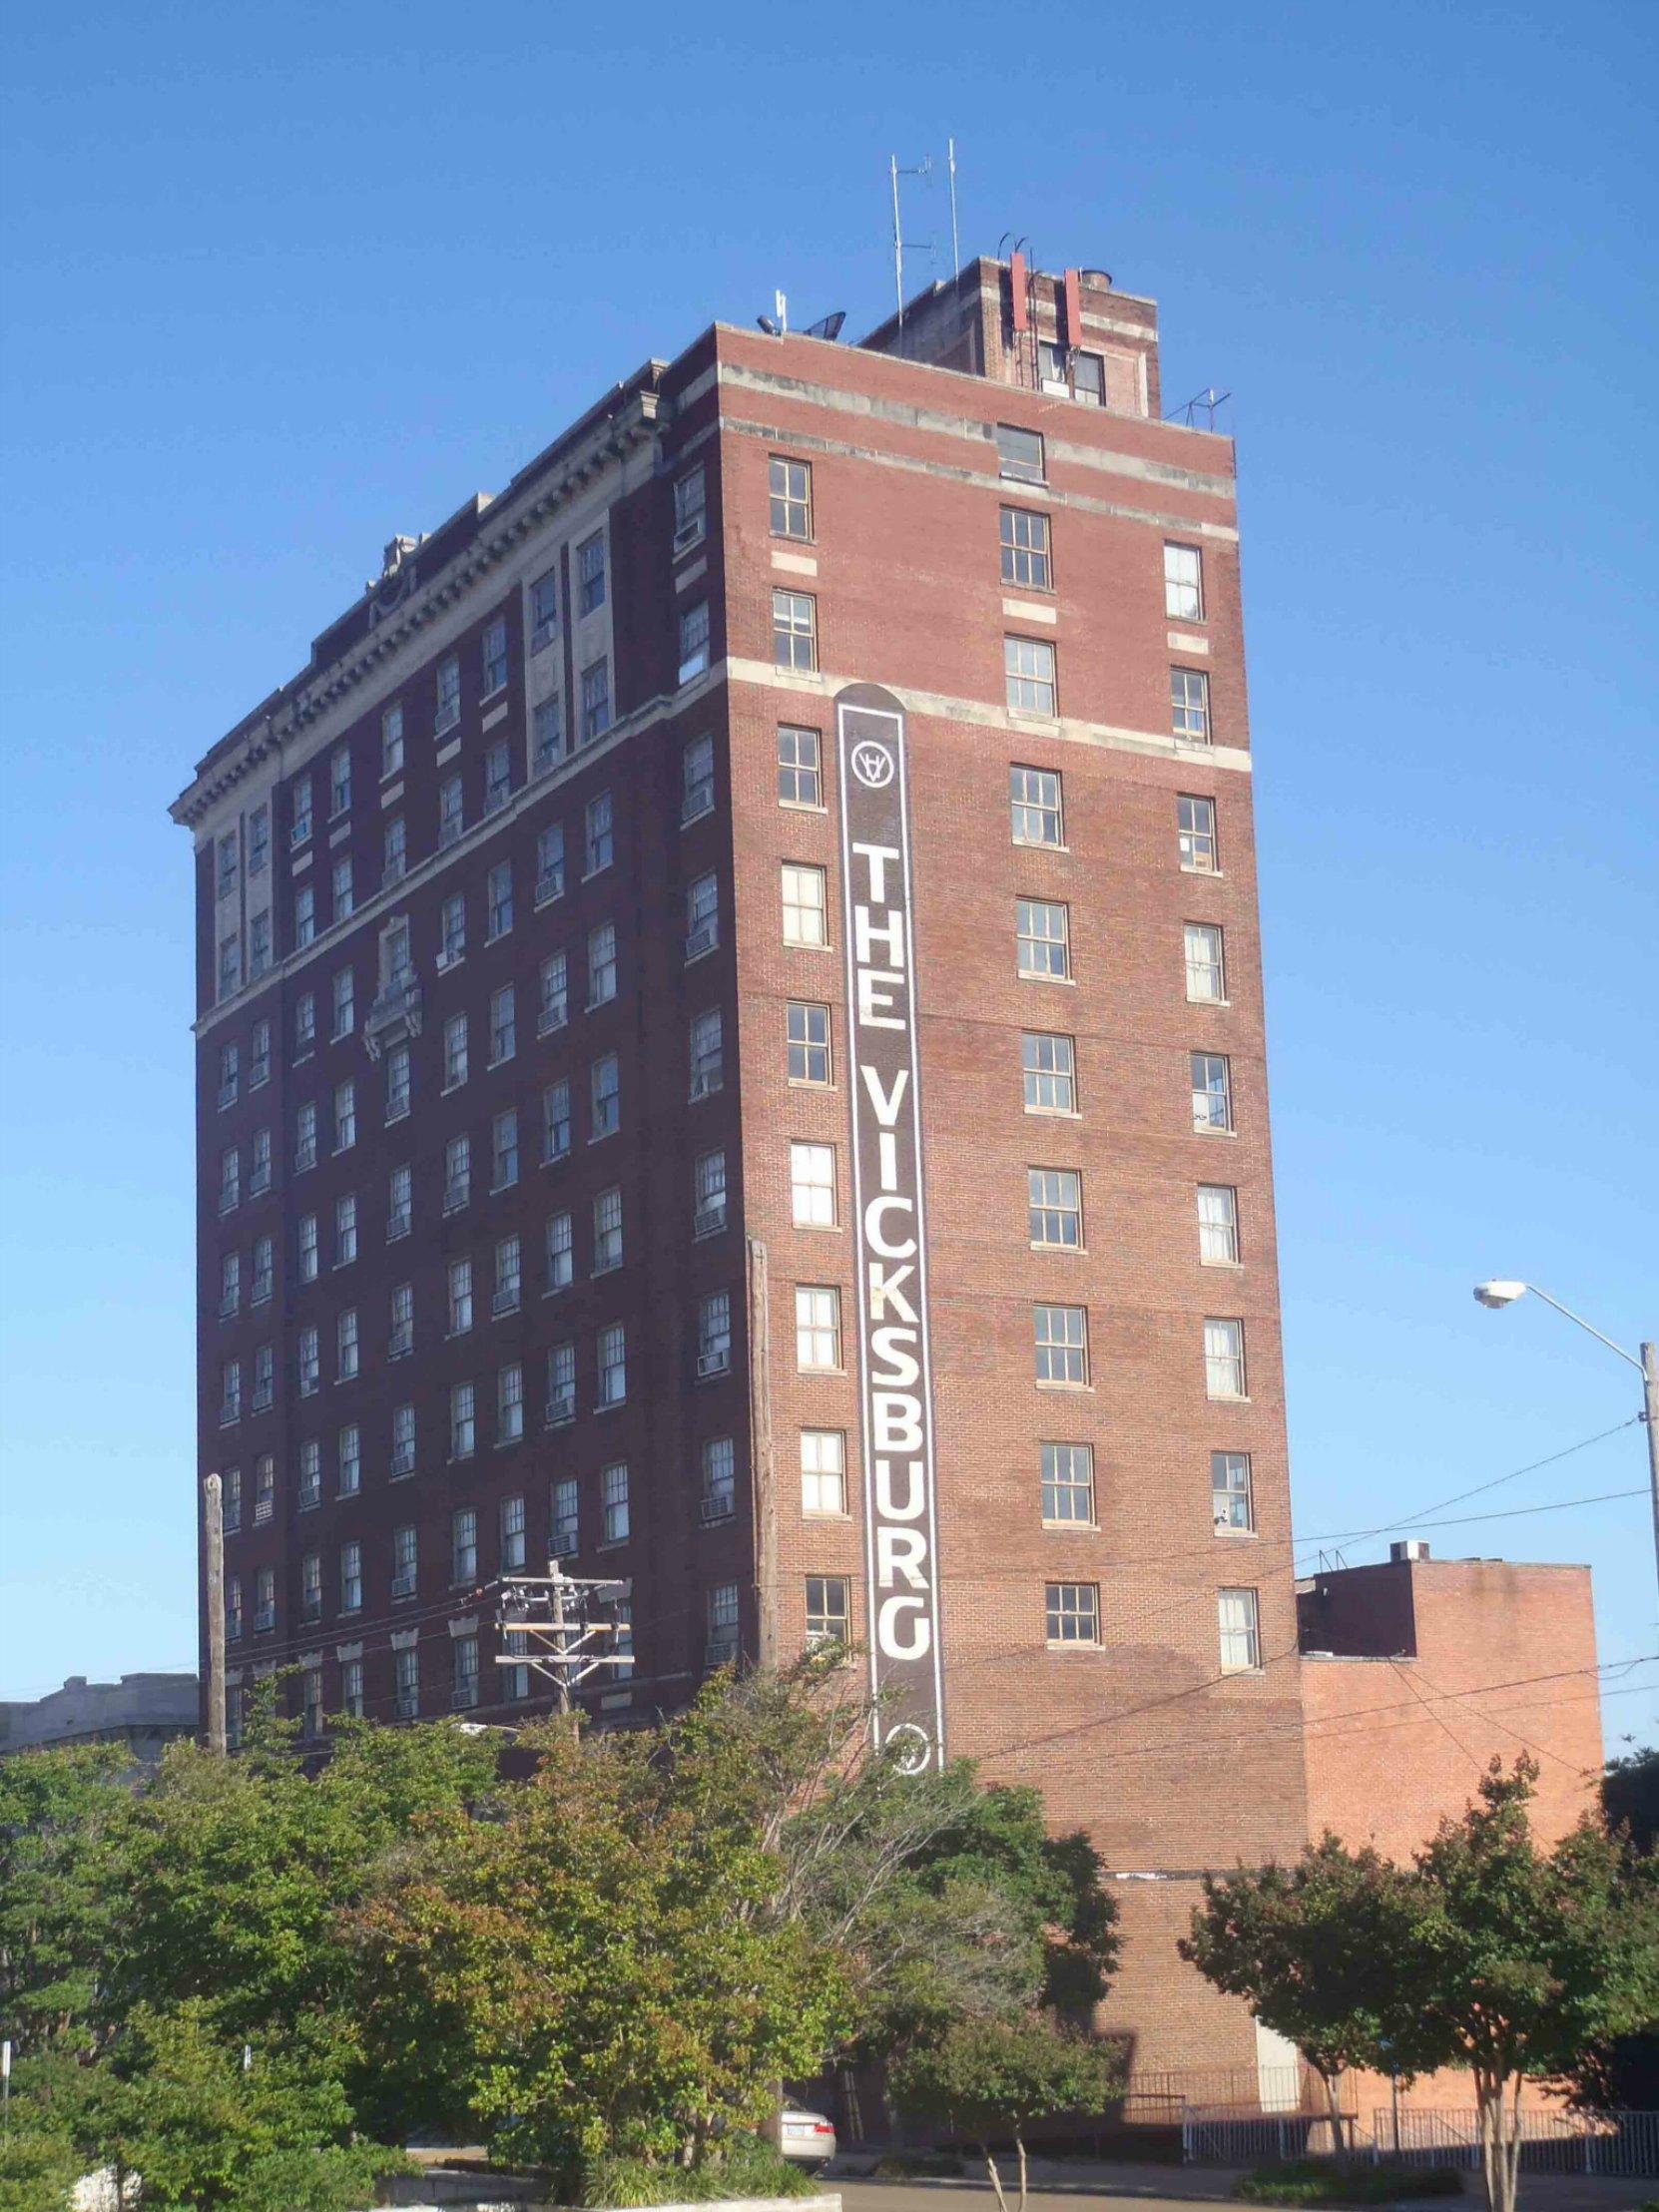 Hotel Vicksburg, Vicksburg, Mississippi